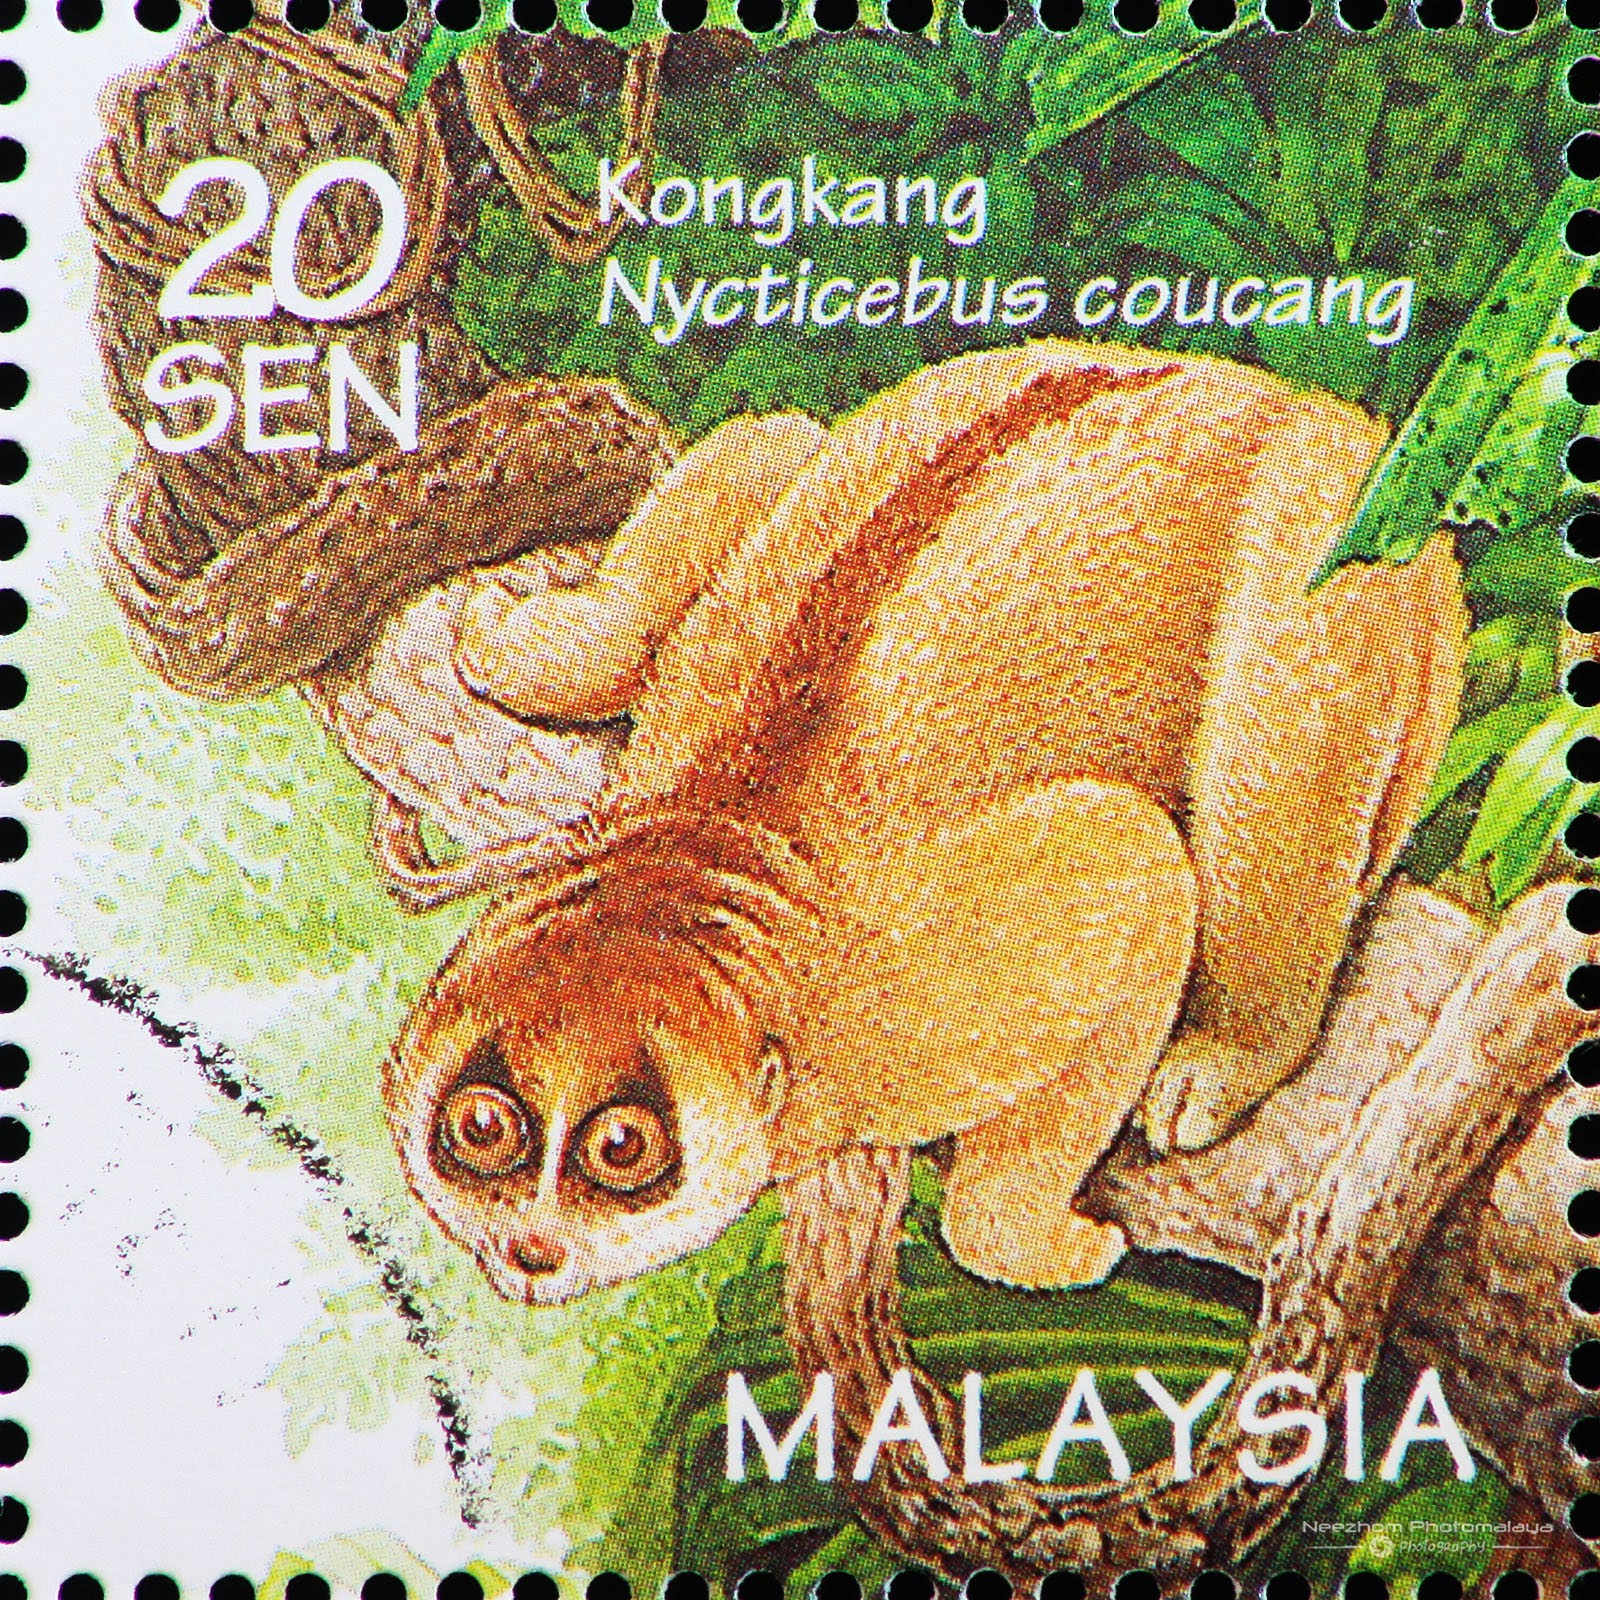 Malaysia 1996 Wildlife - Sunda Slow Loris / Kongkang (Nycticebus coucang) 20 sen